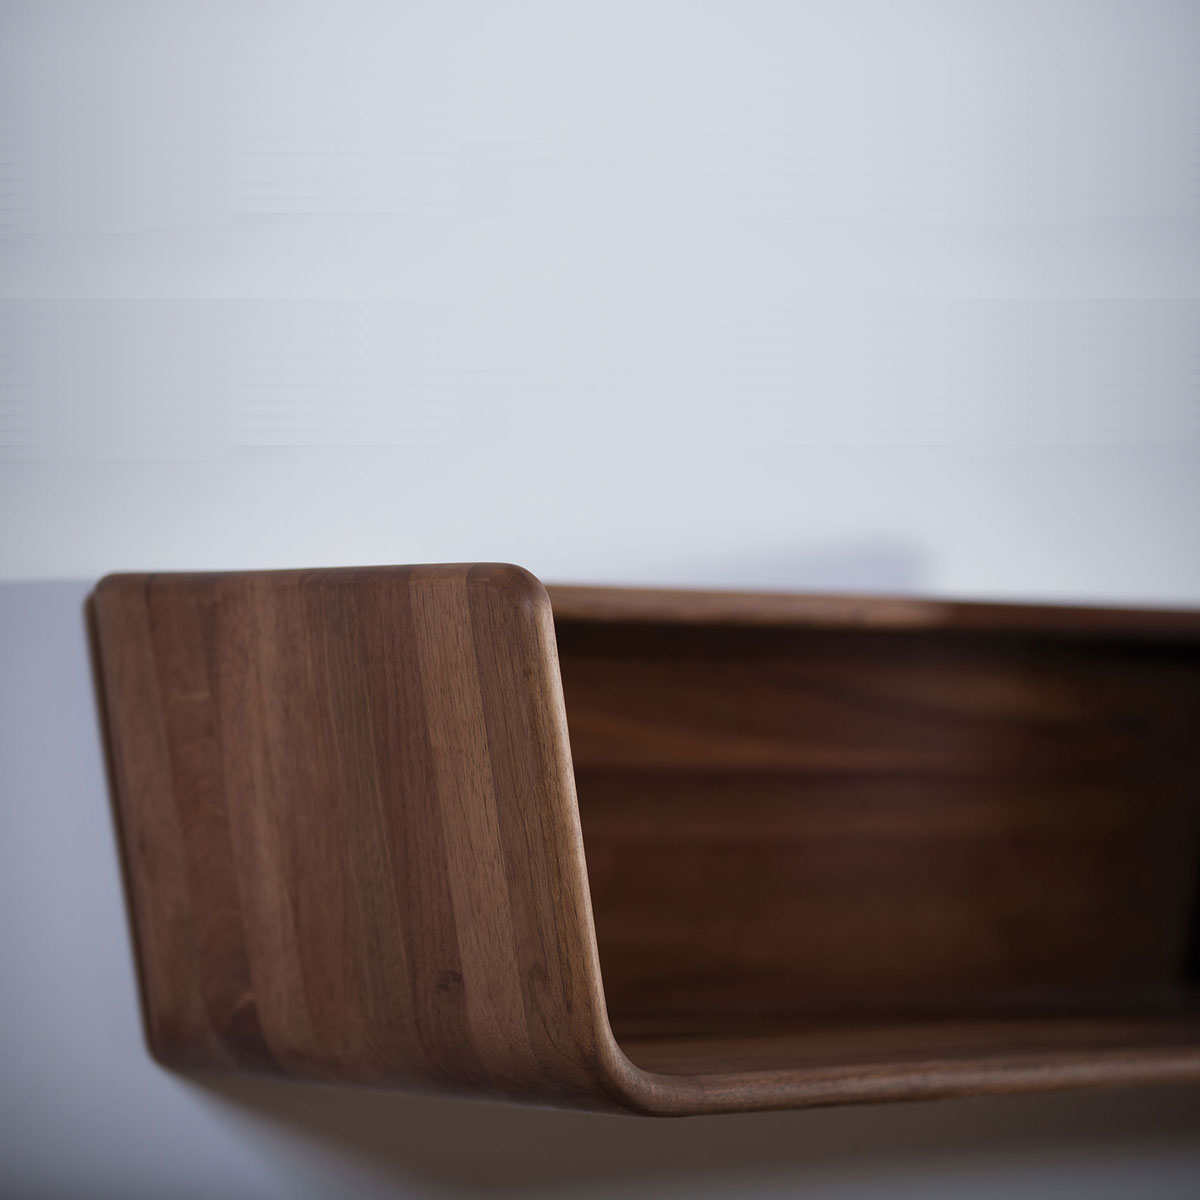 Mueble modular latus pared en madera de dise o for Mueble modular